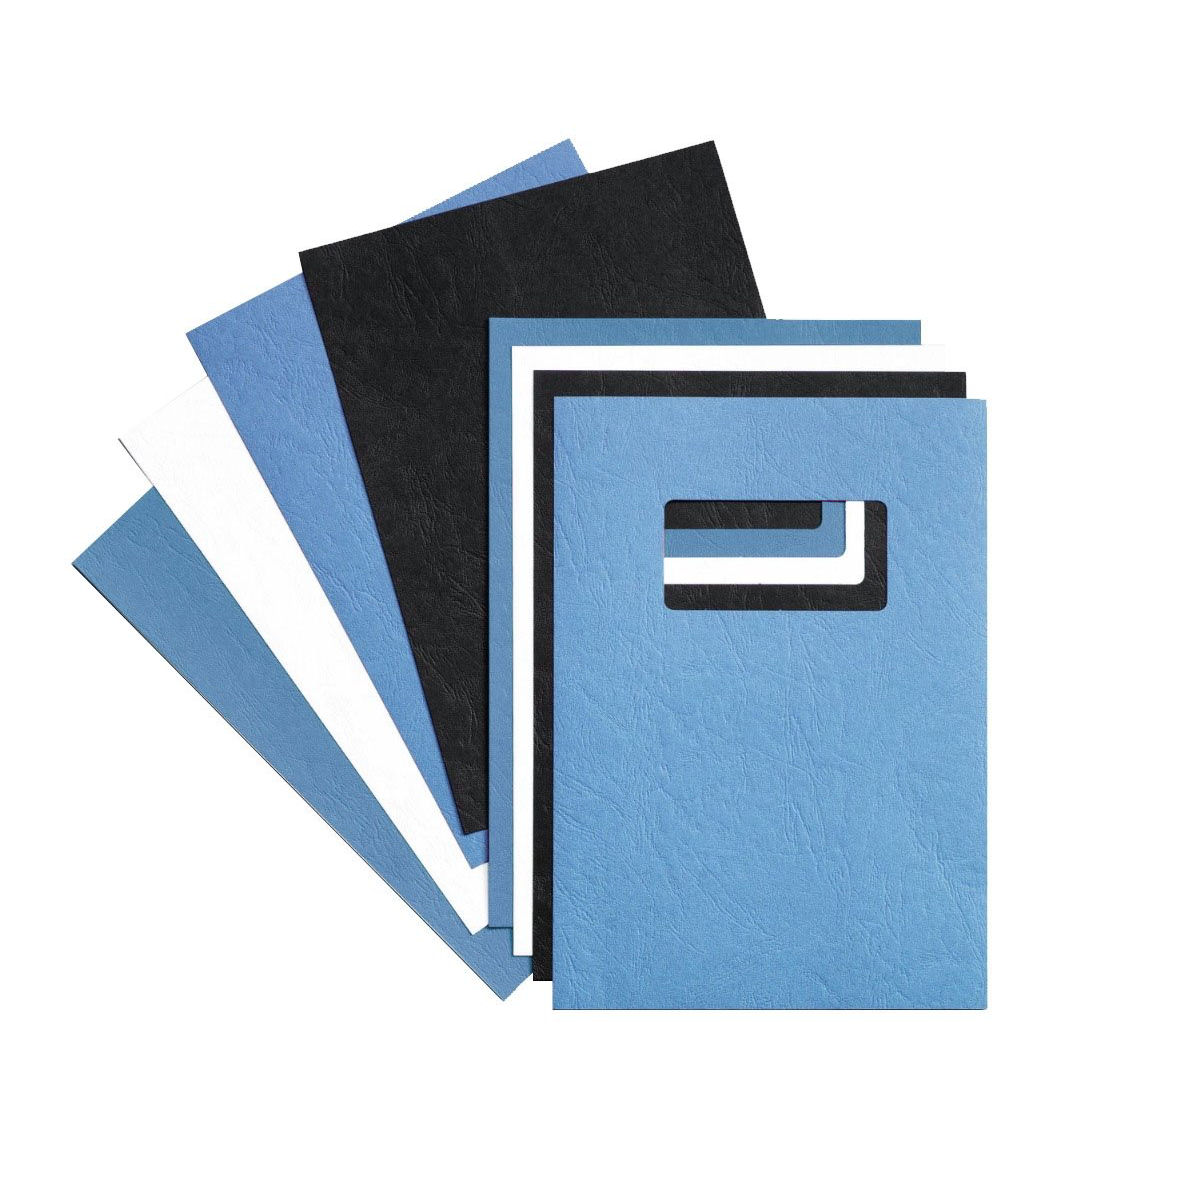 Rexel Binding Covers Window A4 Leathergrain Blue (25) 46735